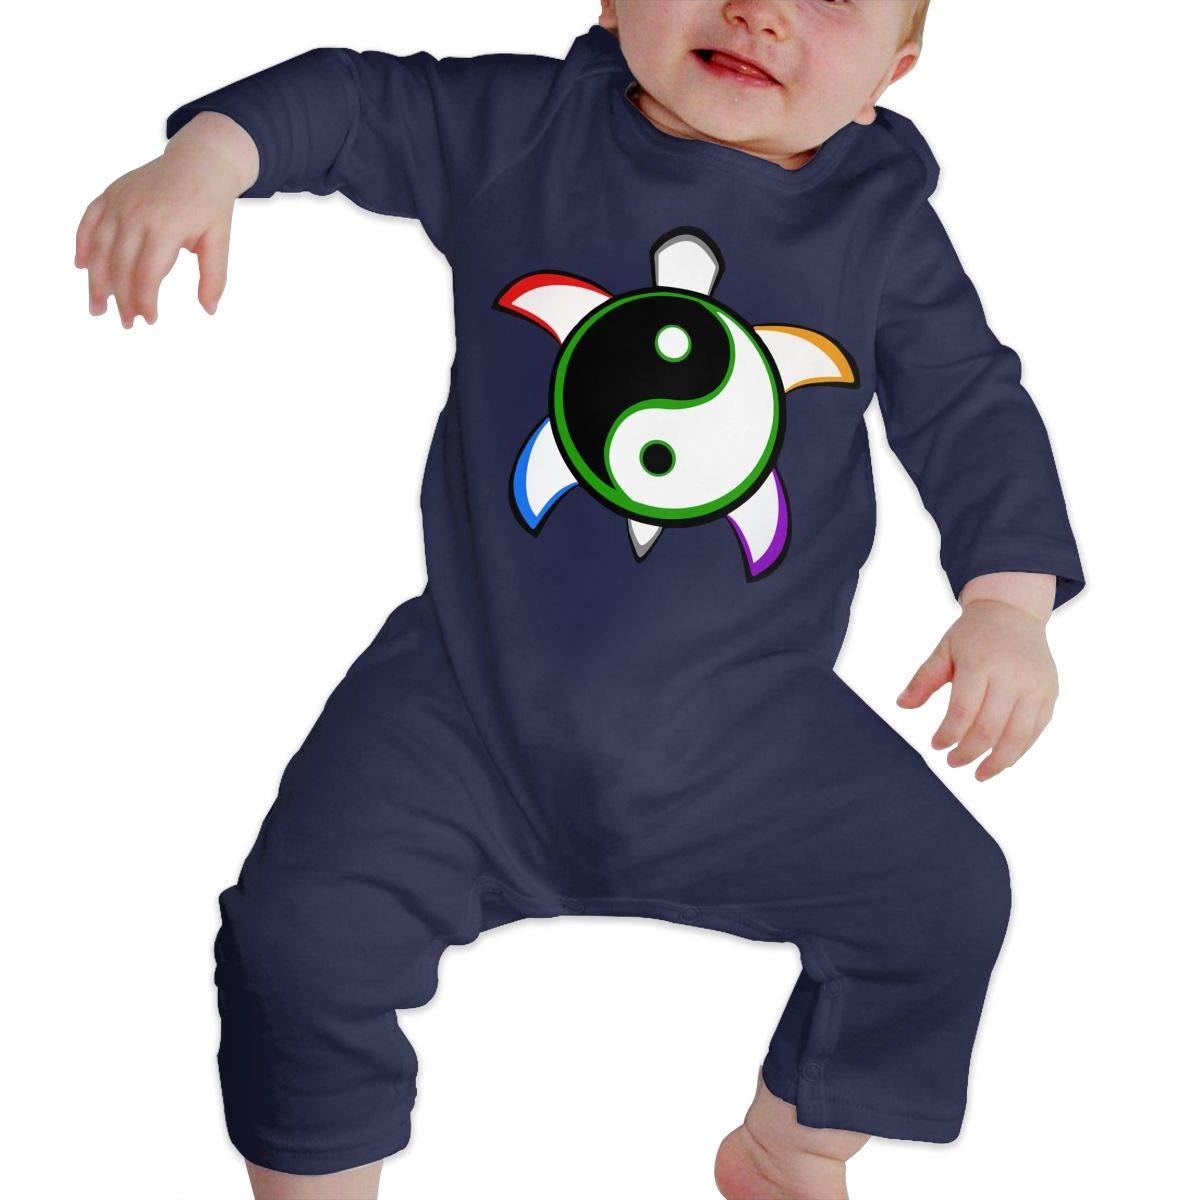 Yin Yang Turtle Baby Boys Sleep and Play Romper Jumpsuit